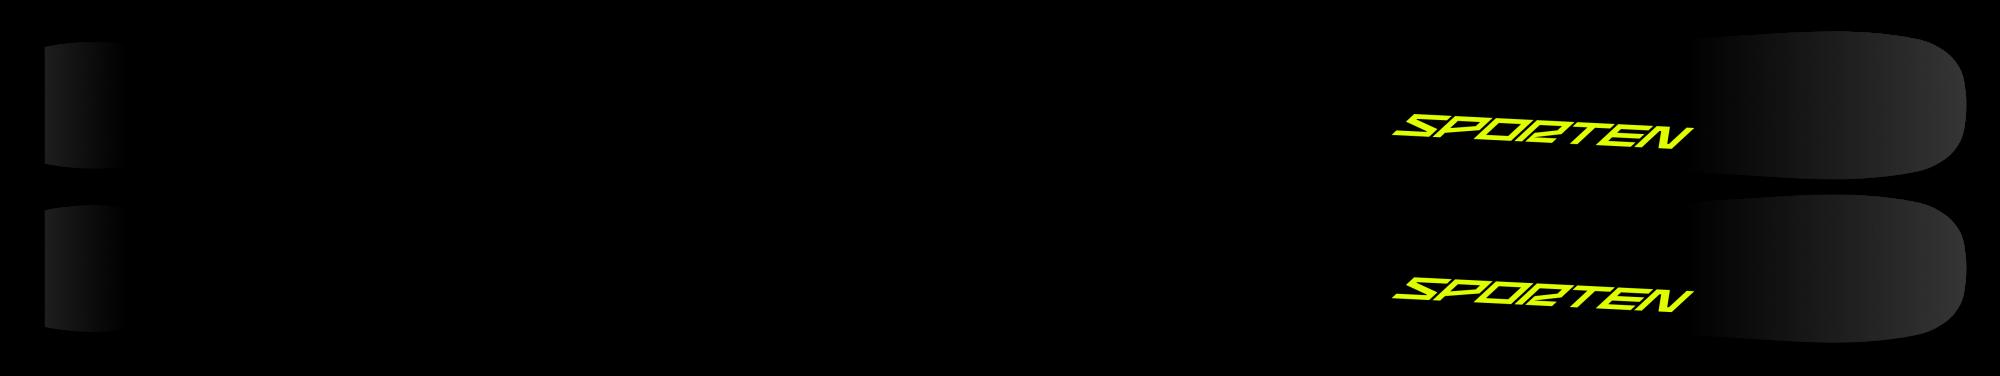 Sporten Iridium 5 2021.pngI.png